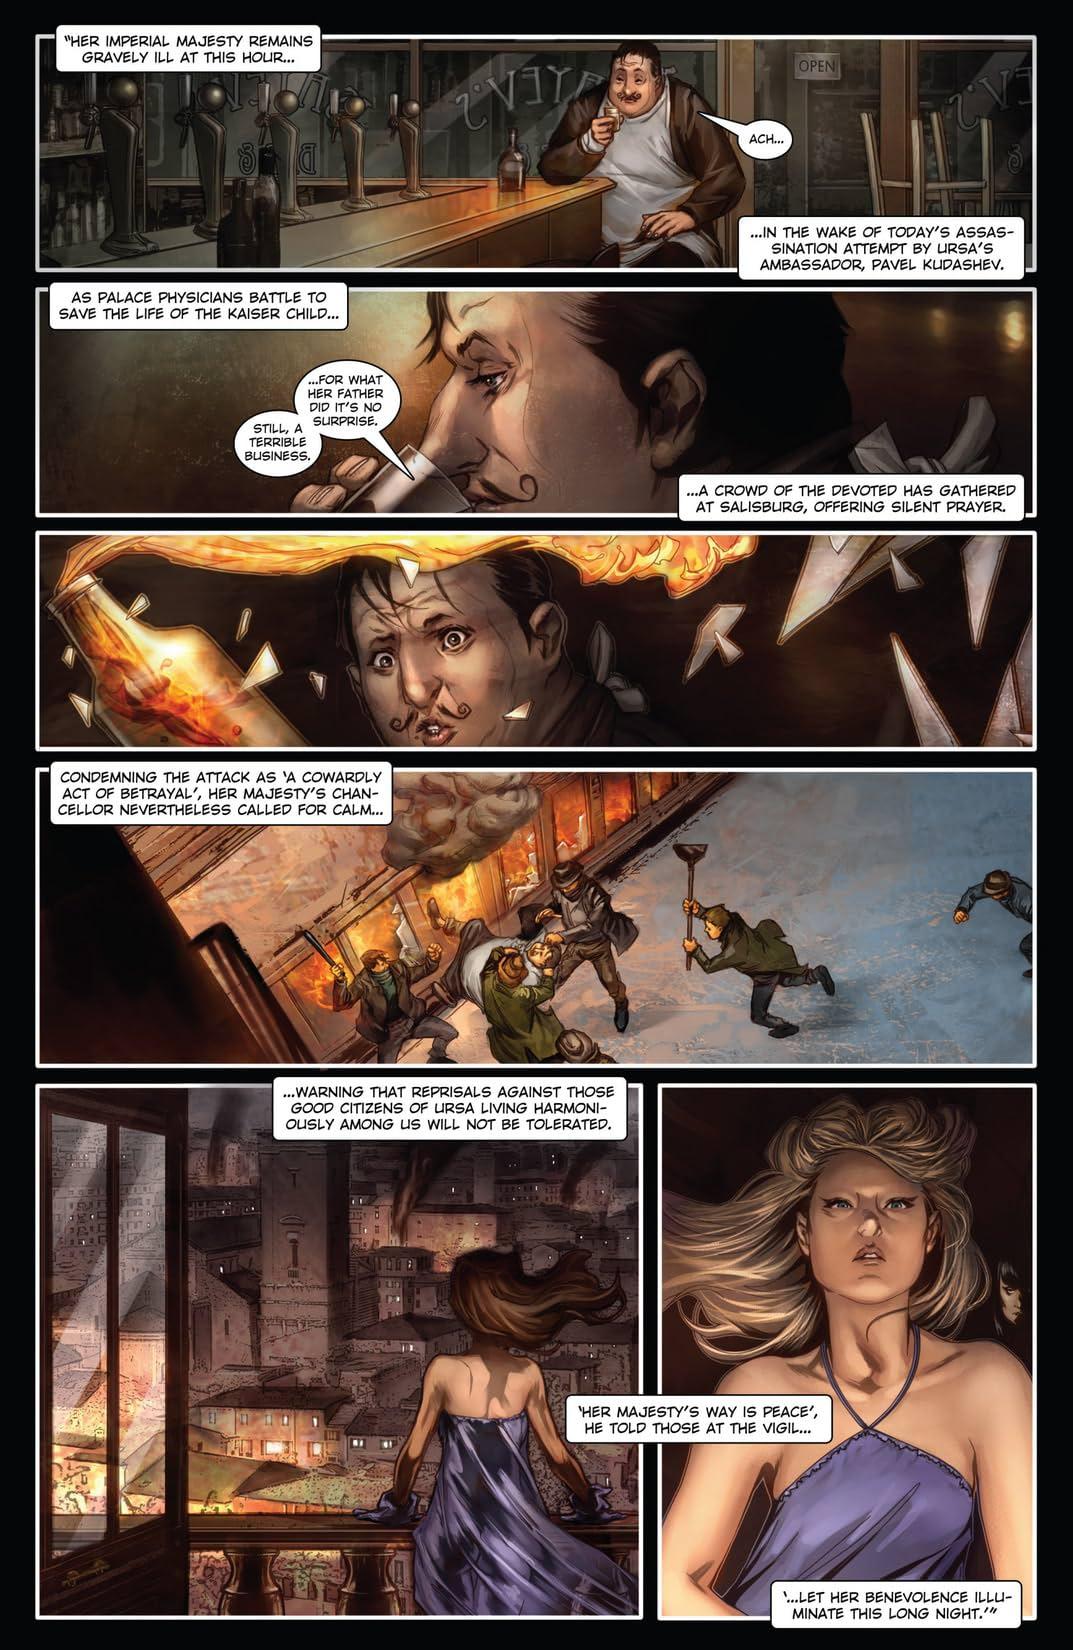 Carbon Grey Vol. 2 #3 (of 3)